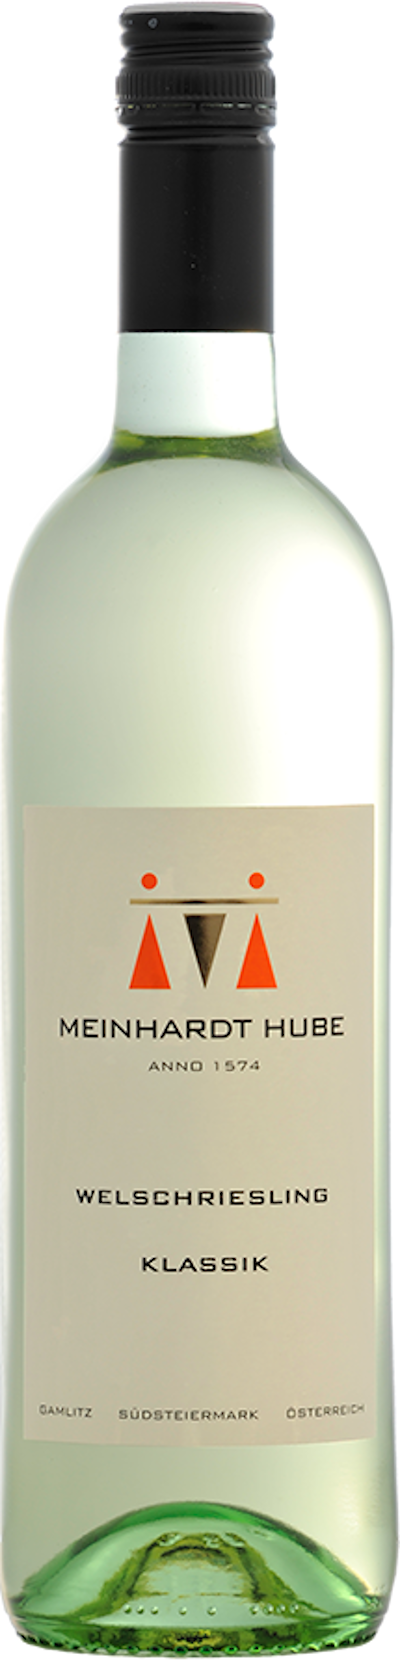 Meinhardt Hube - Welschriesling Südsteiermark